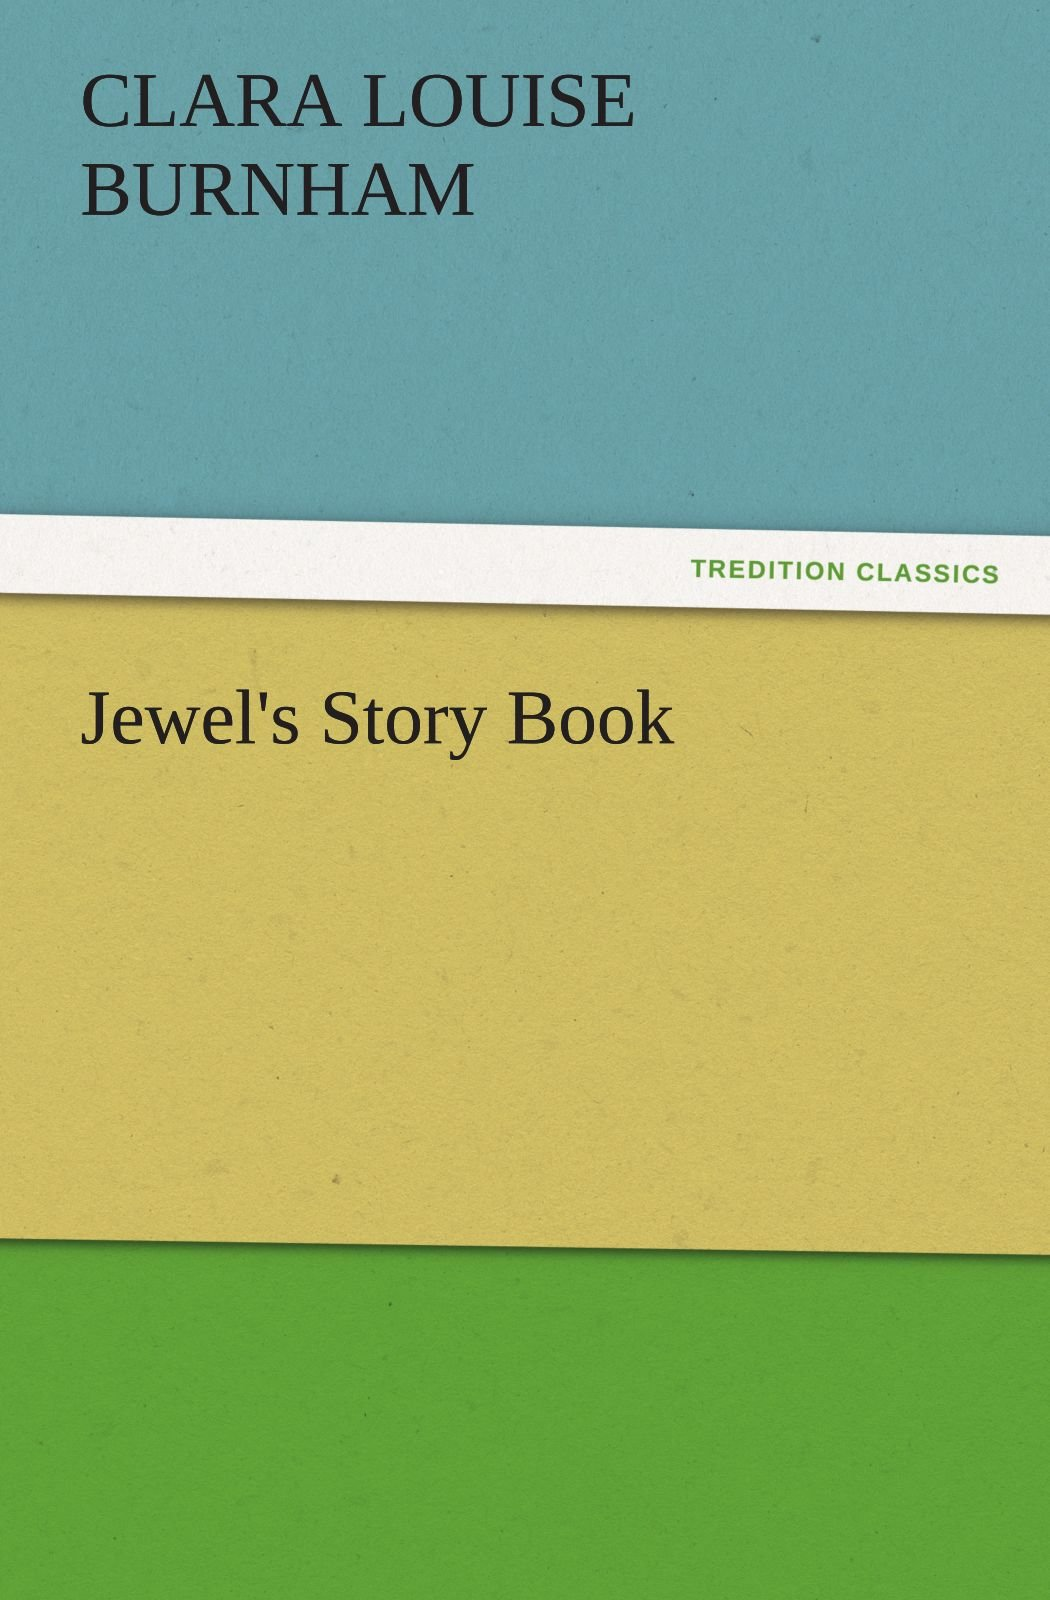 Jewel's Story Book (TREDITION CLASSICS) PDF